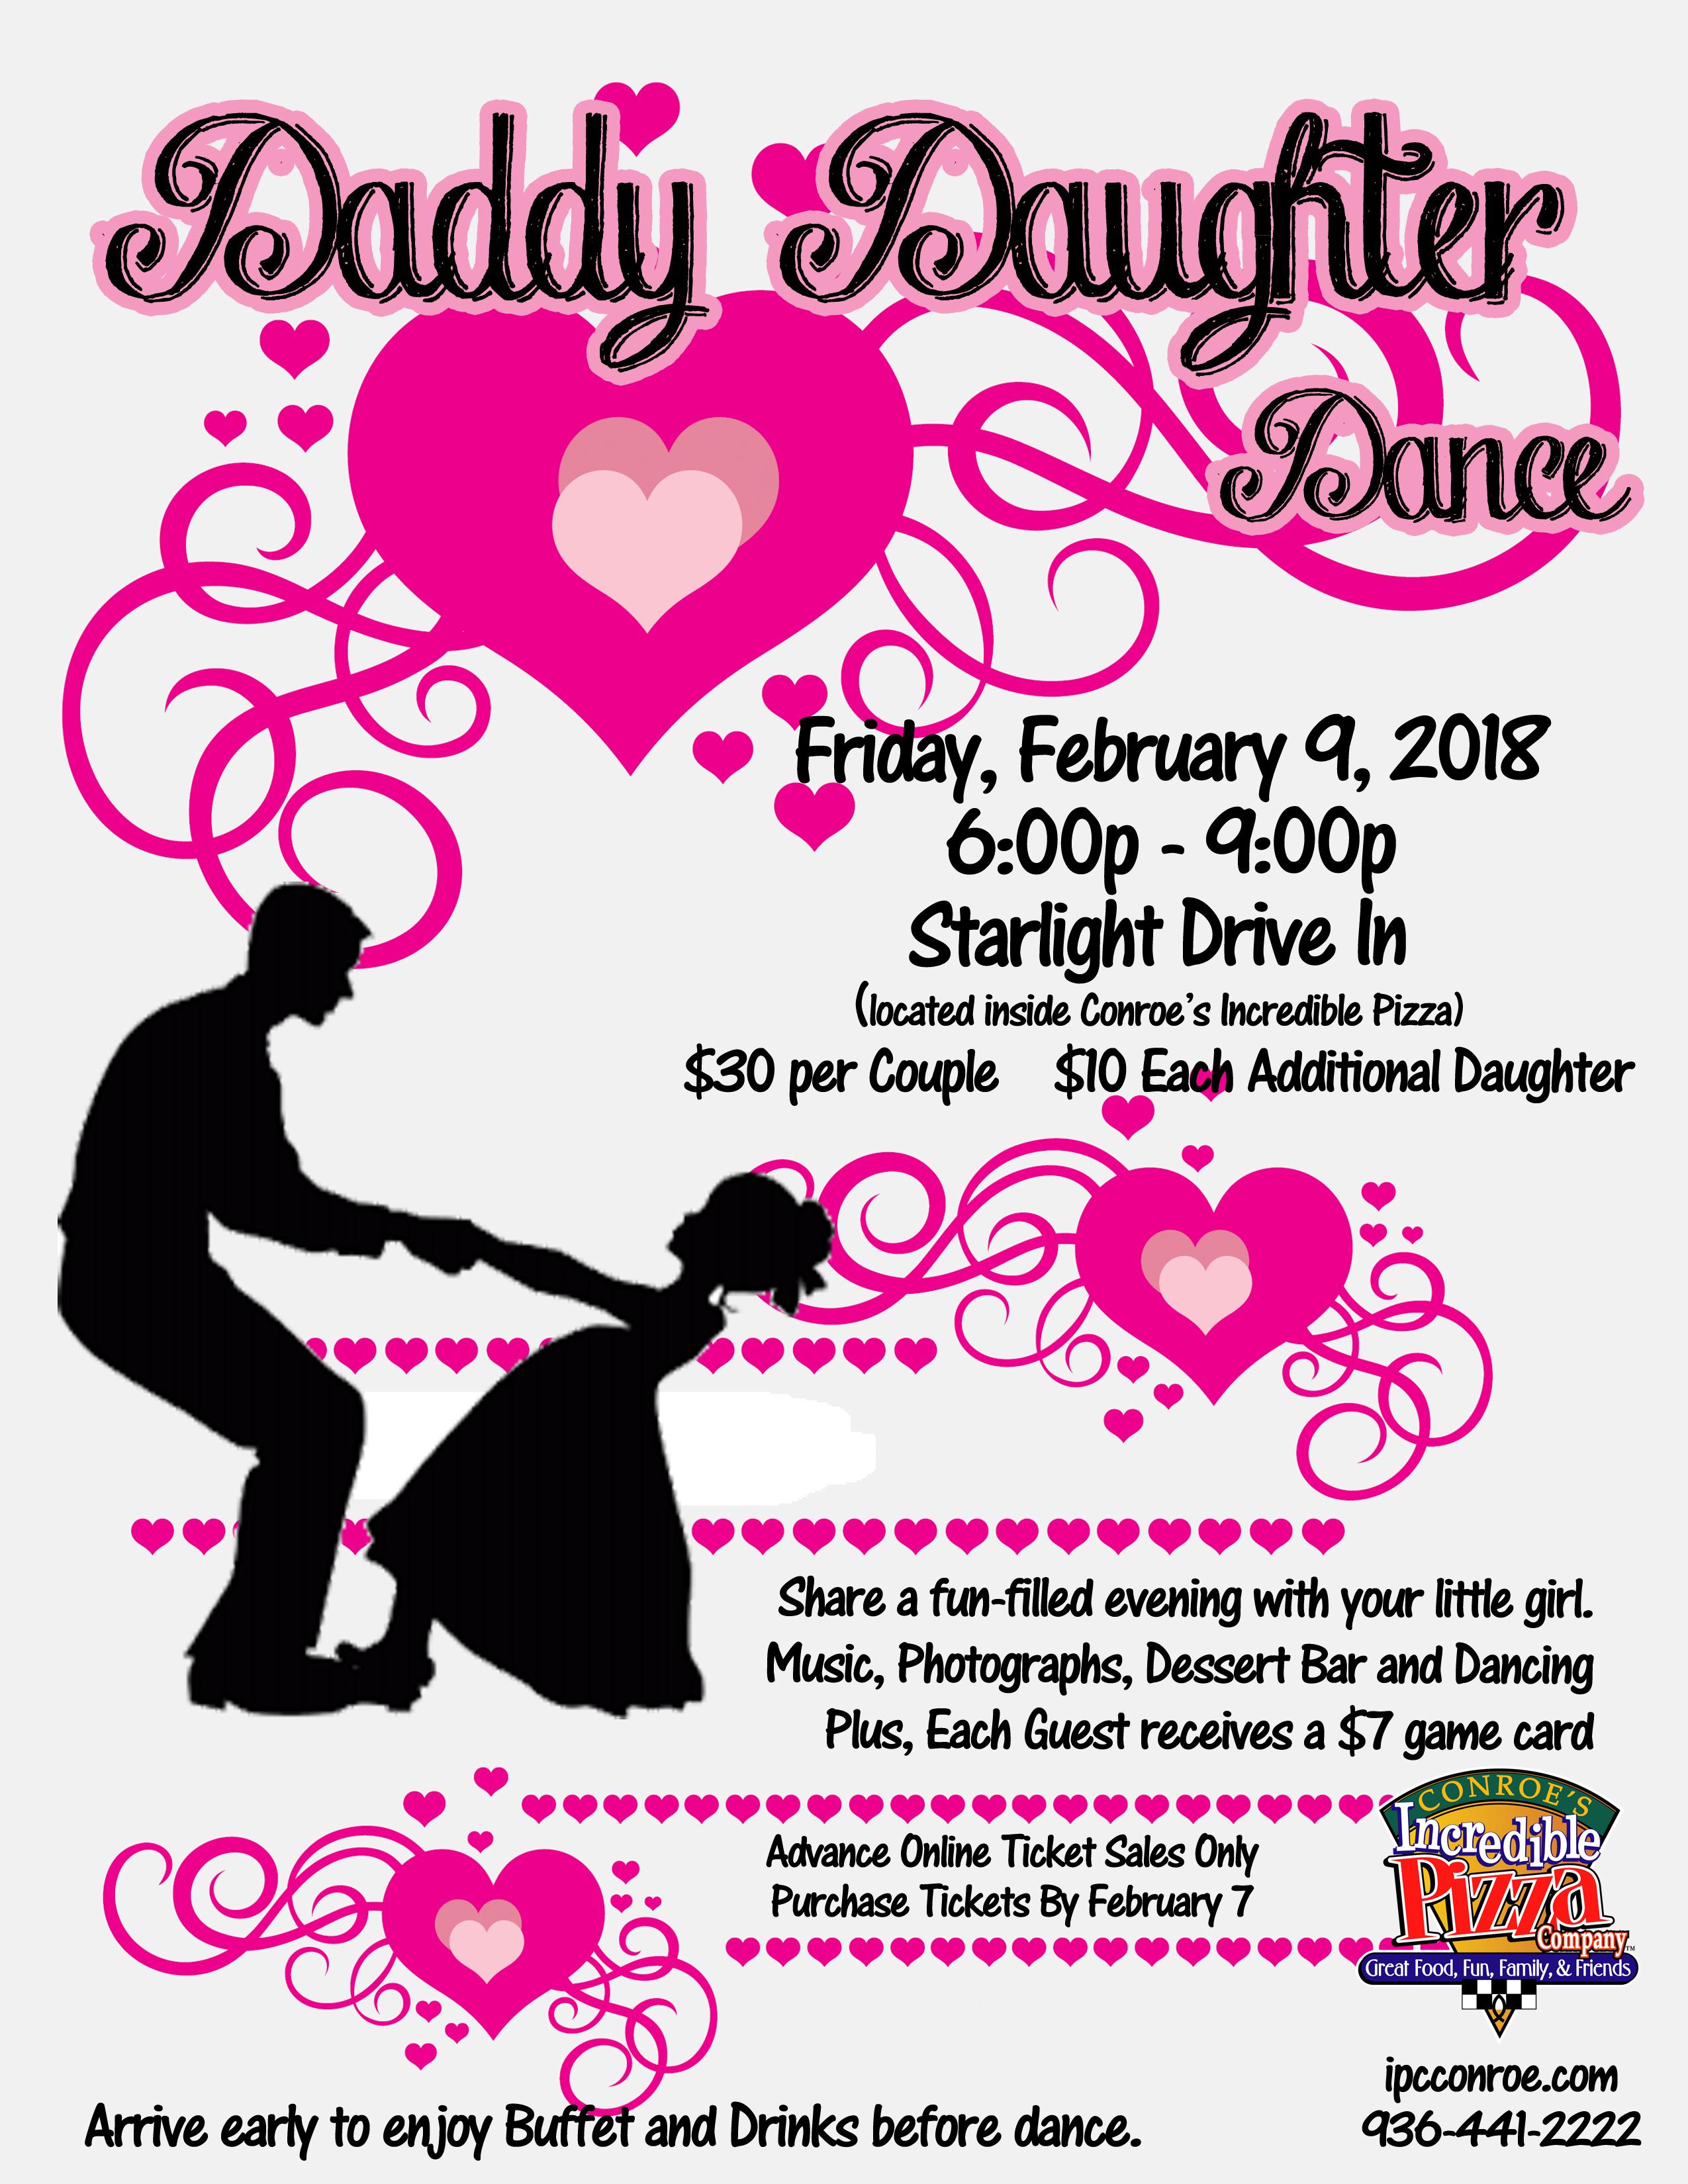 Daddy Daughter Dance – Fri., Feb. 9